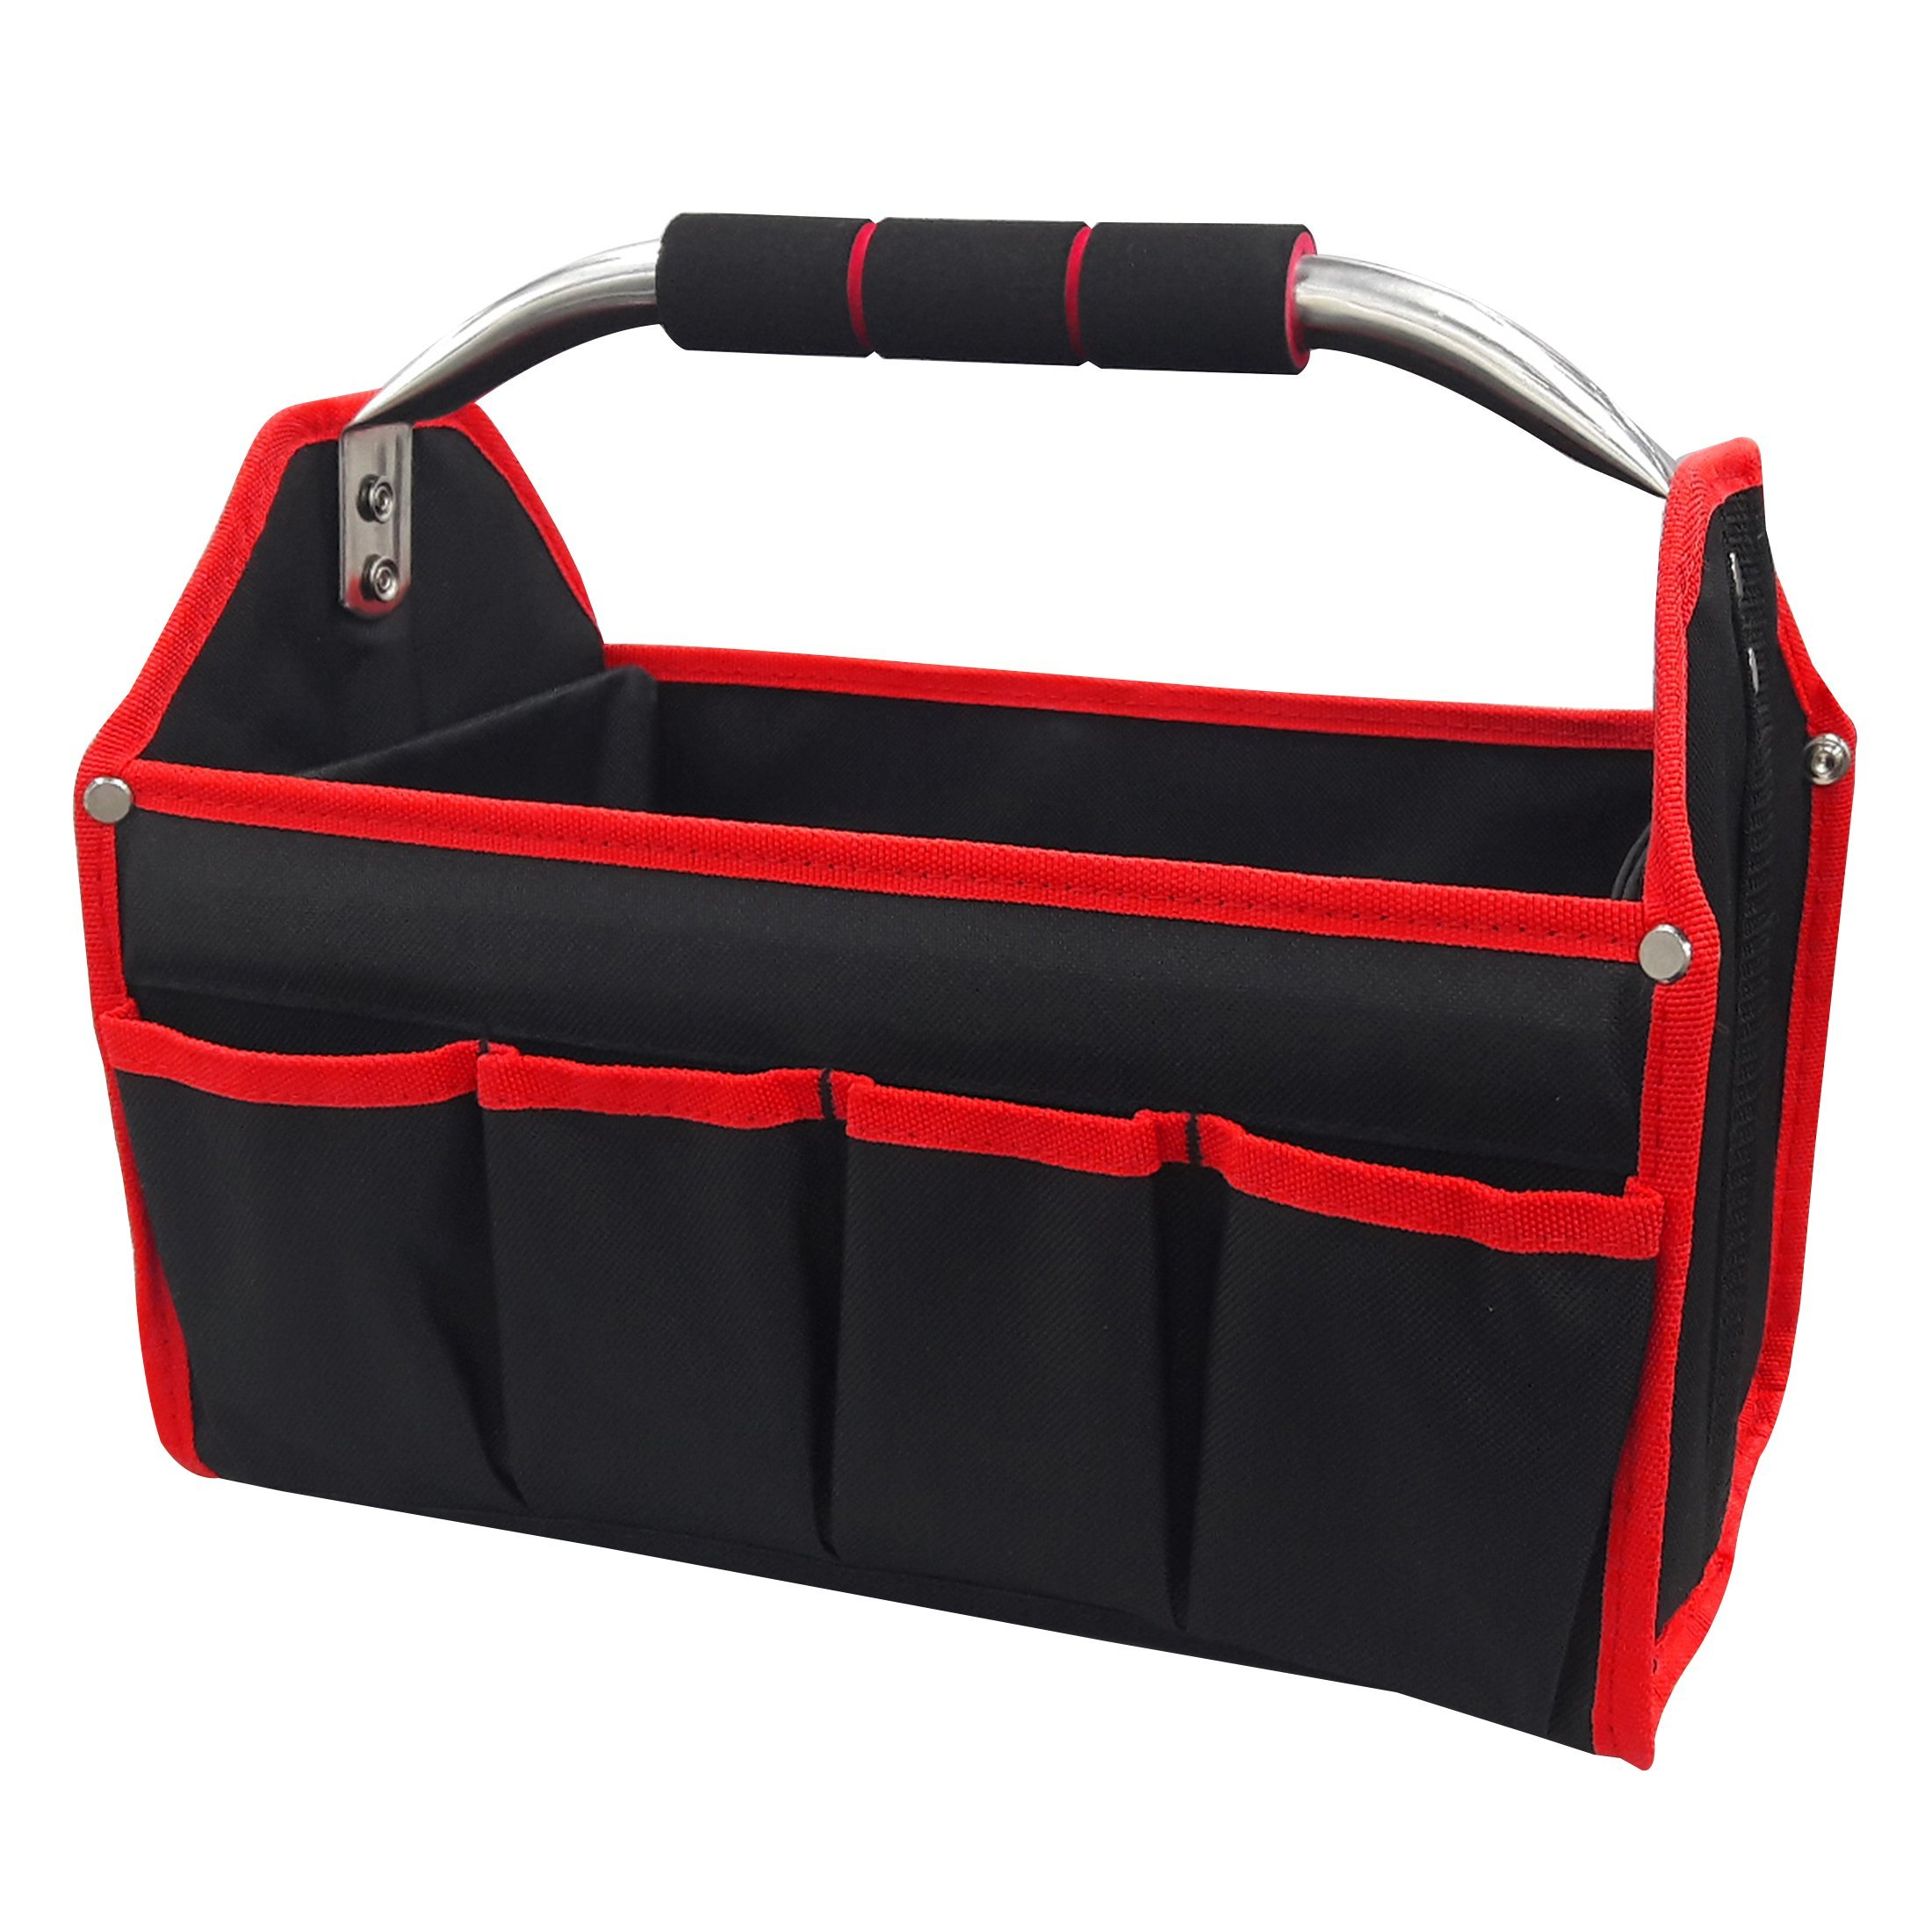 HAUTMEC 13'' Open-Top Foldable Tool Tote Bag TB0001